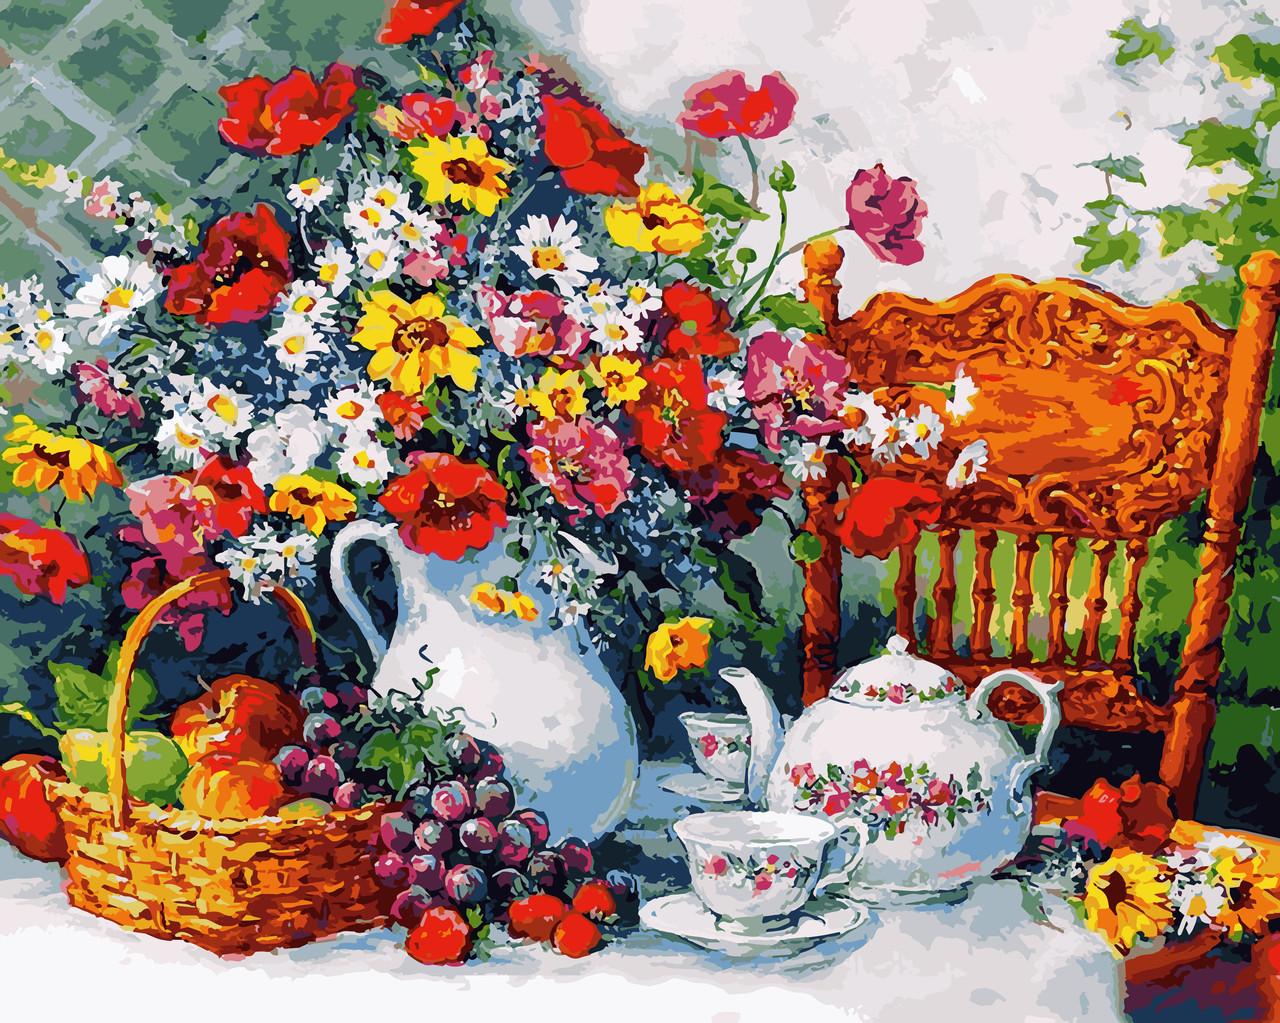 VP943 Набор-раскраска по номерам Чаепитие в саду